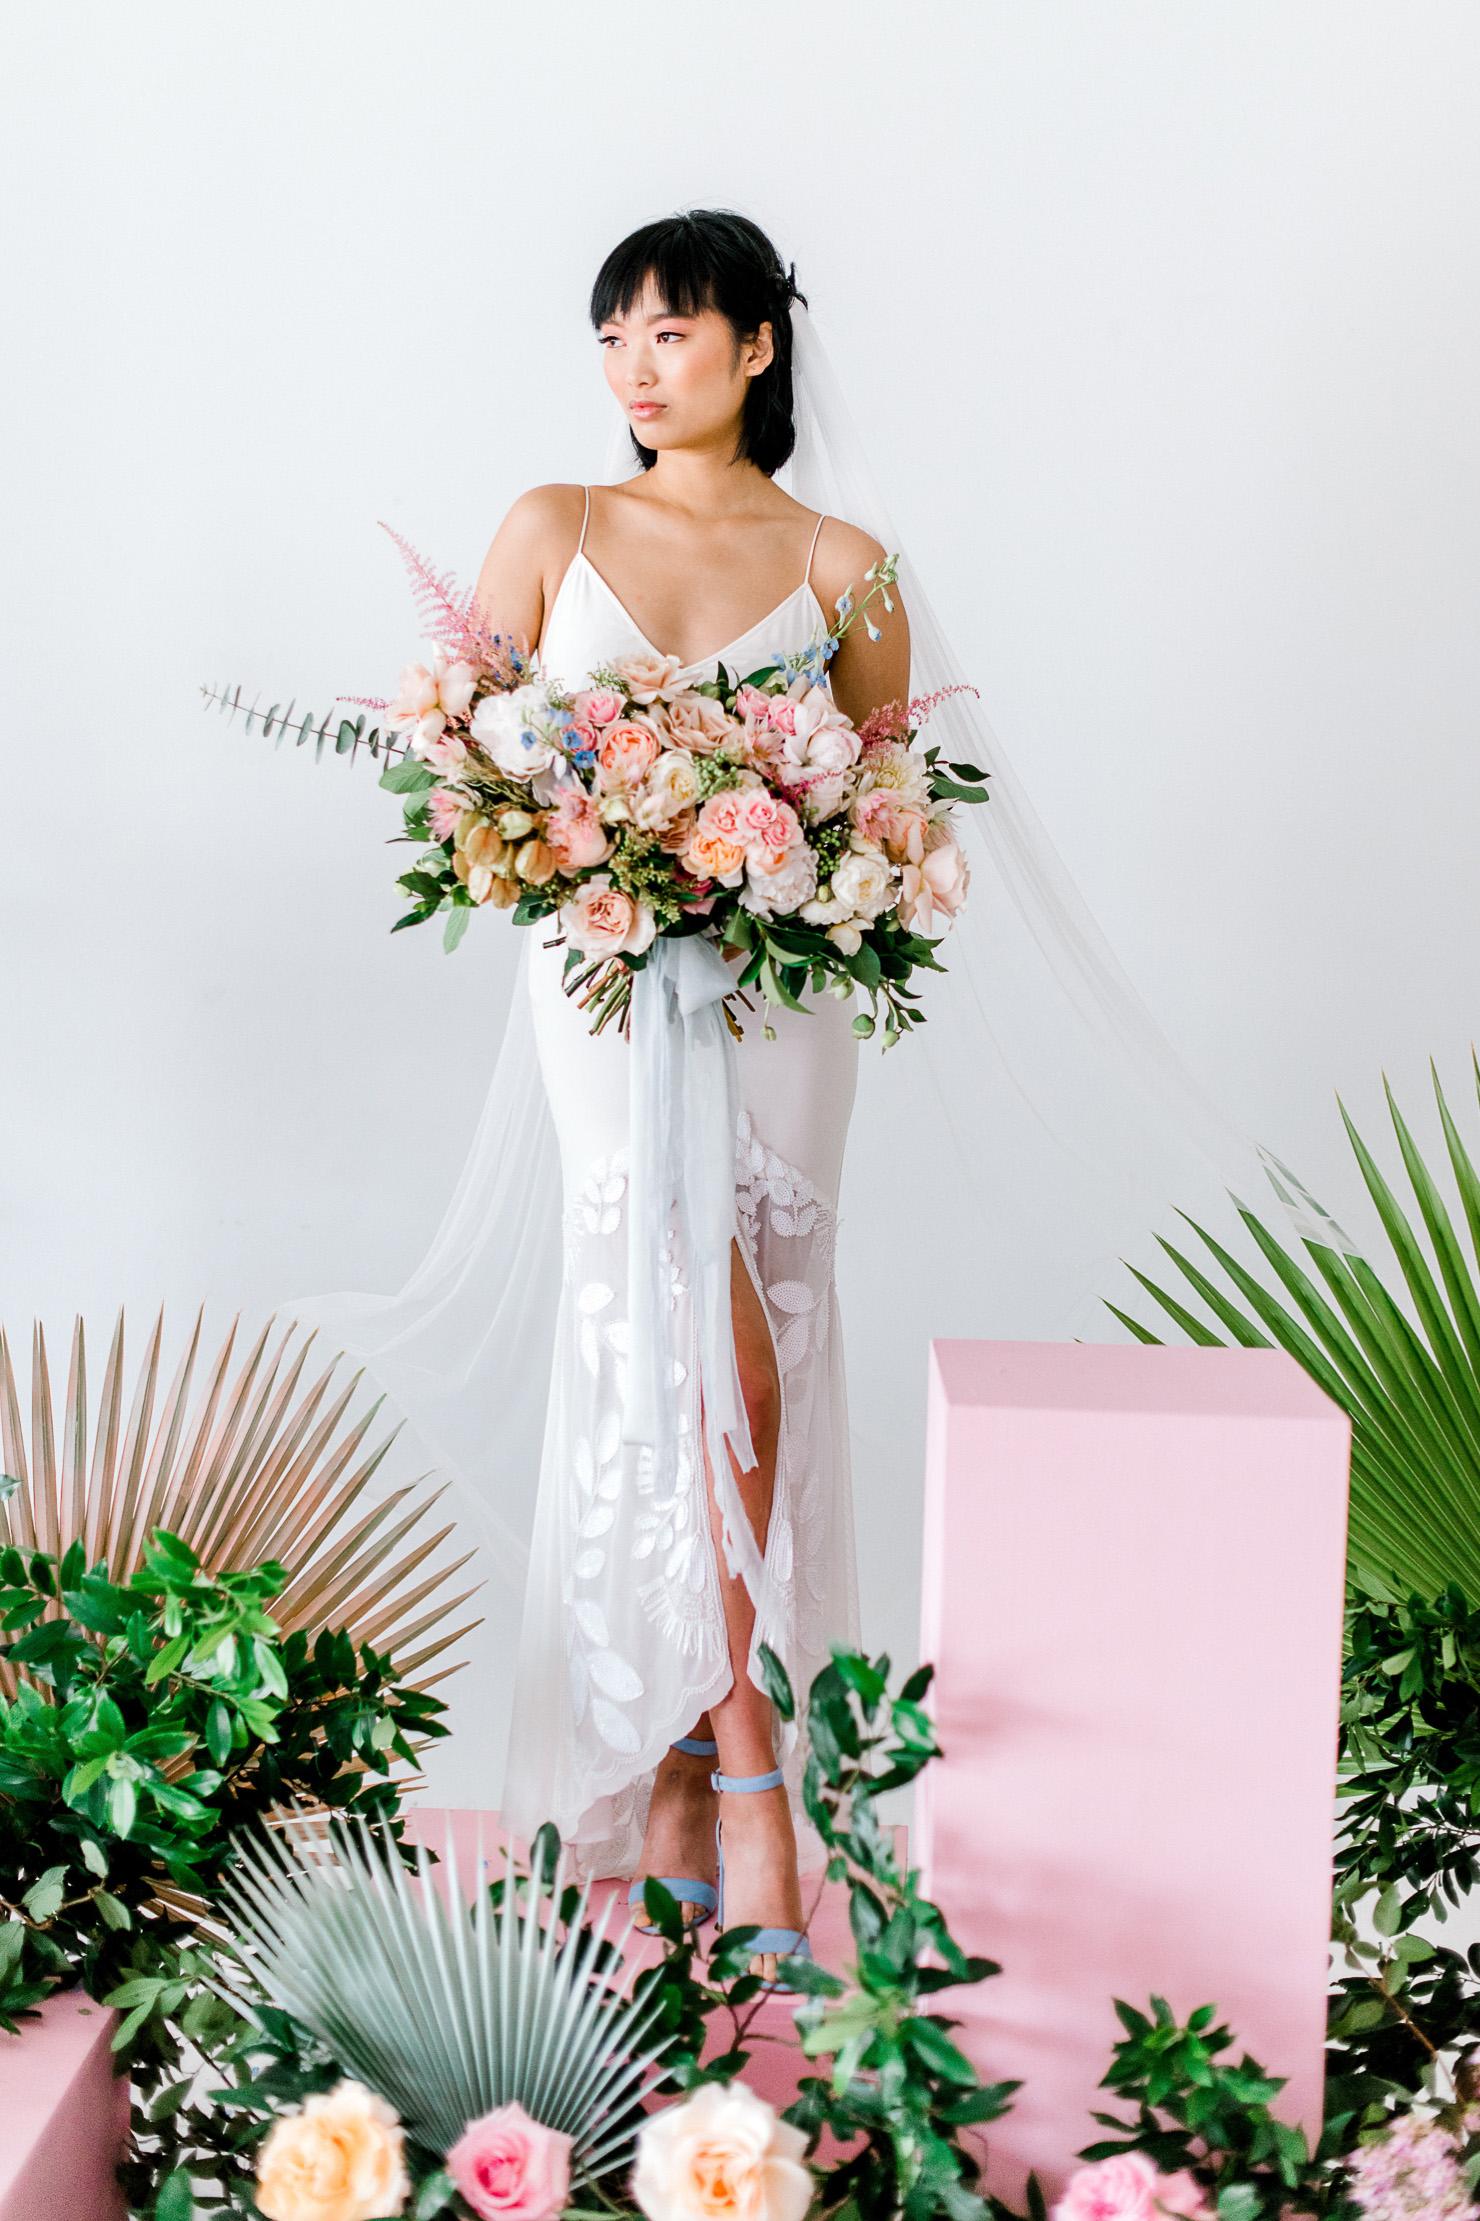 Houston-Wedding-Photographer-Editorial-Fine-Art-Film-Destination-Dallas-Texas-Mibellarosa-Josh-Dana-Fernandez-Photography-225.jpg